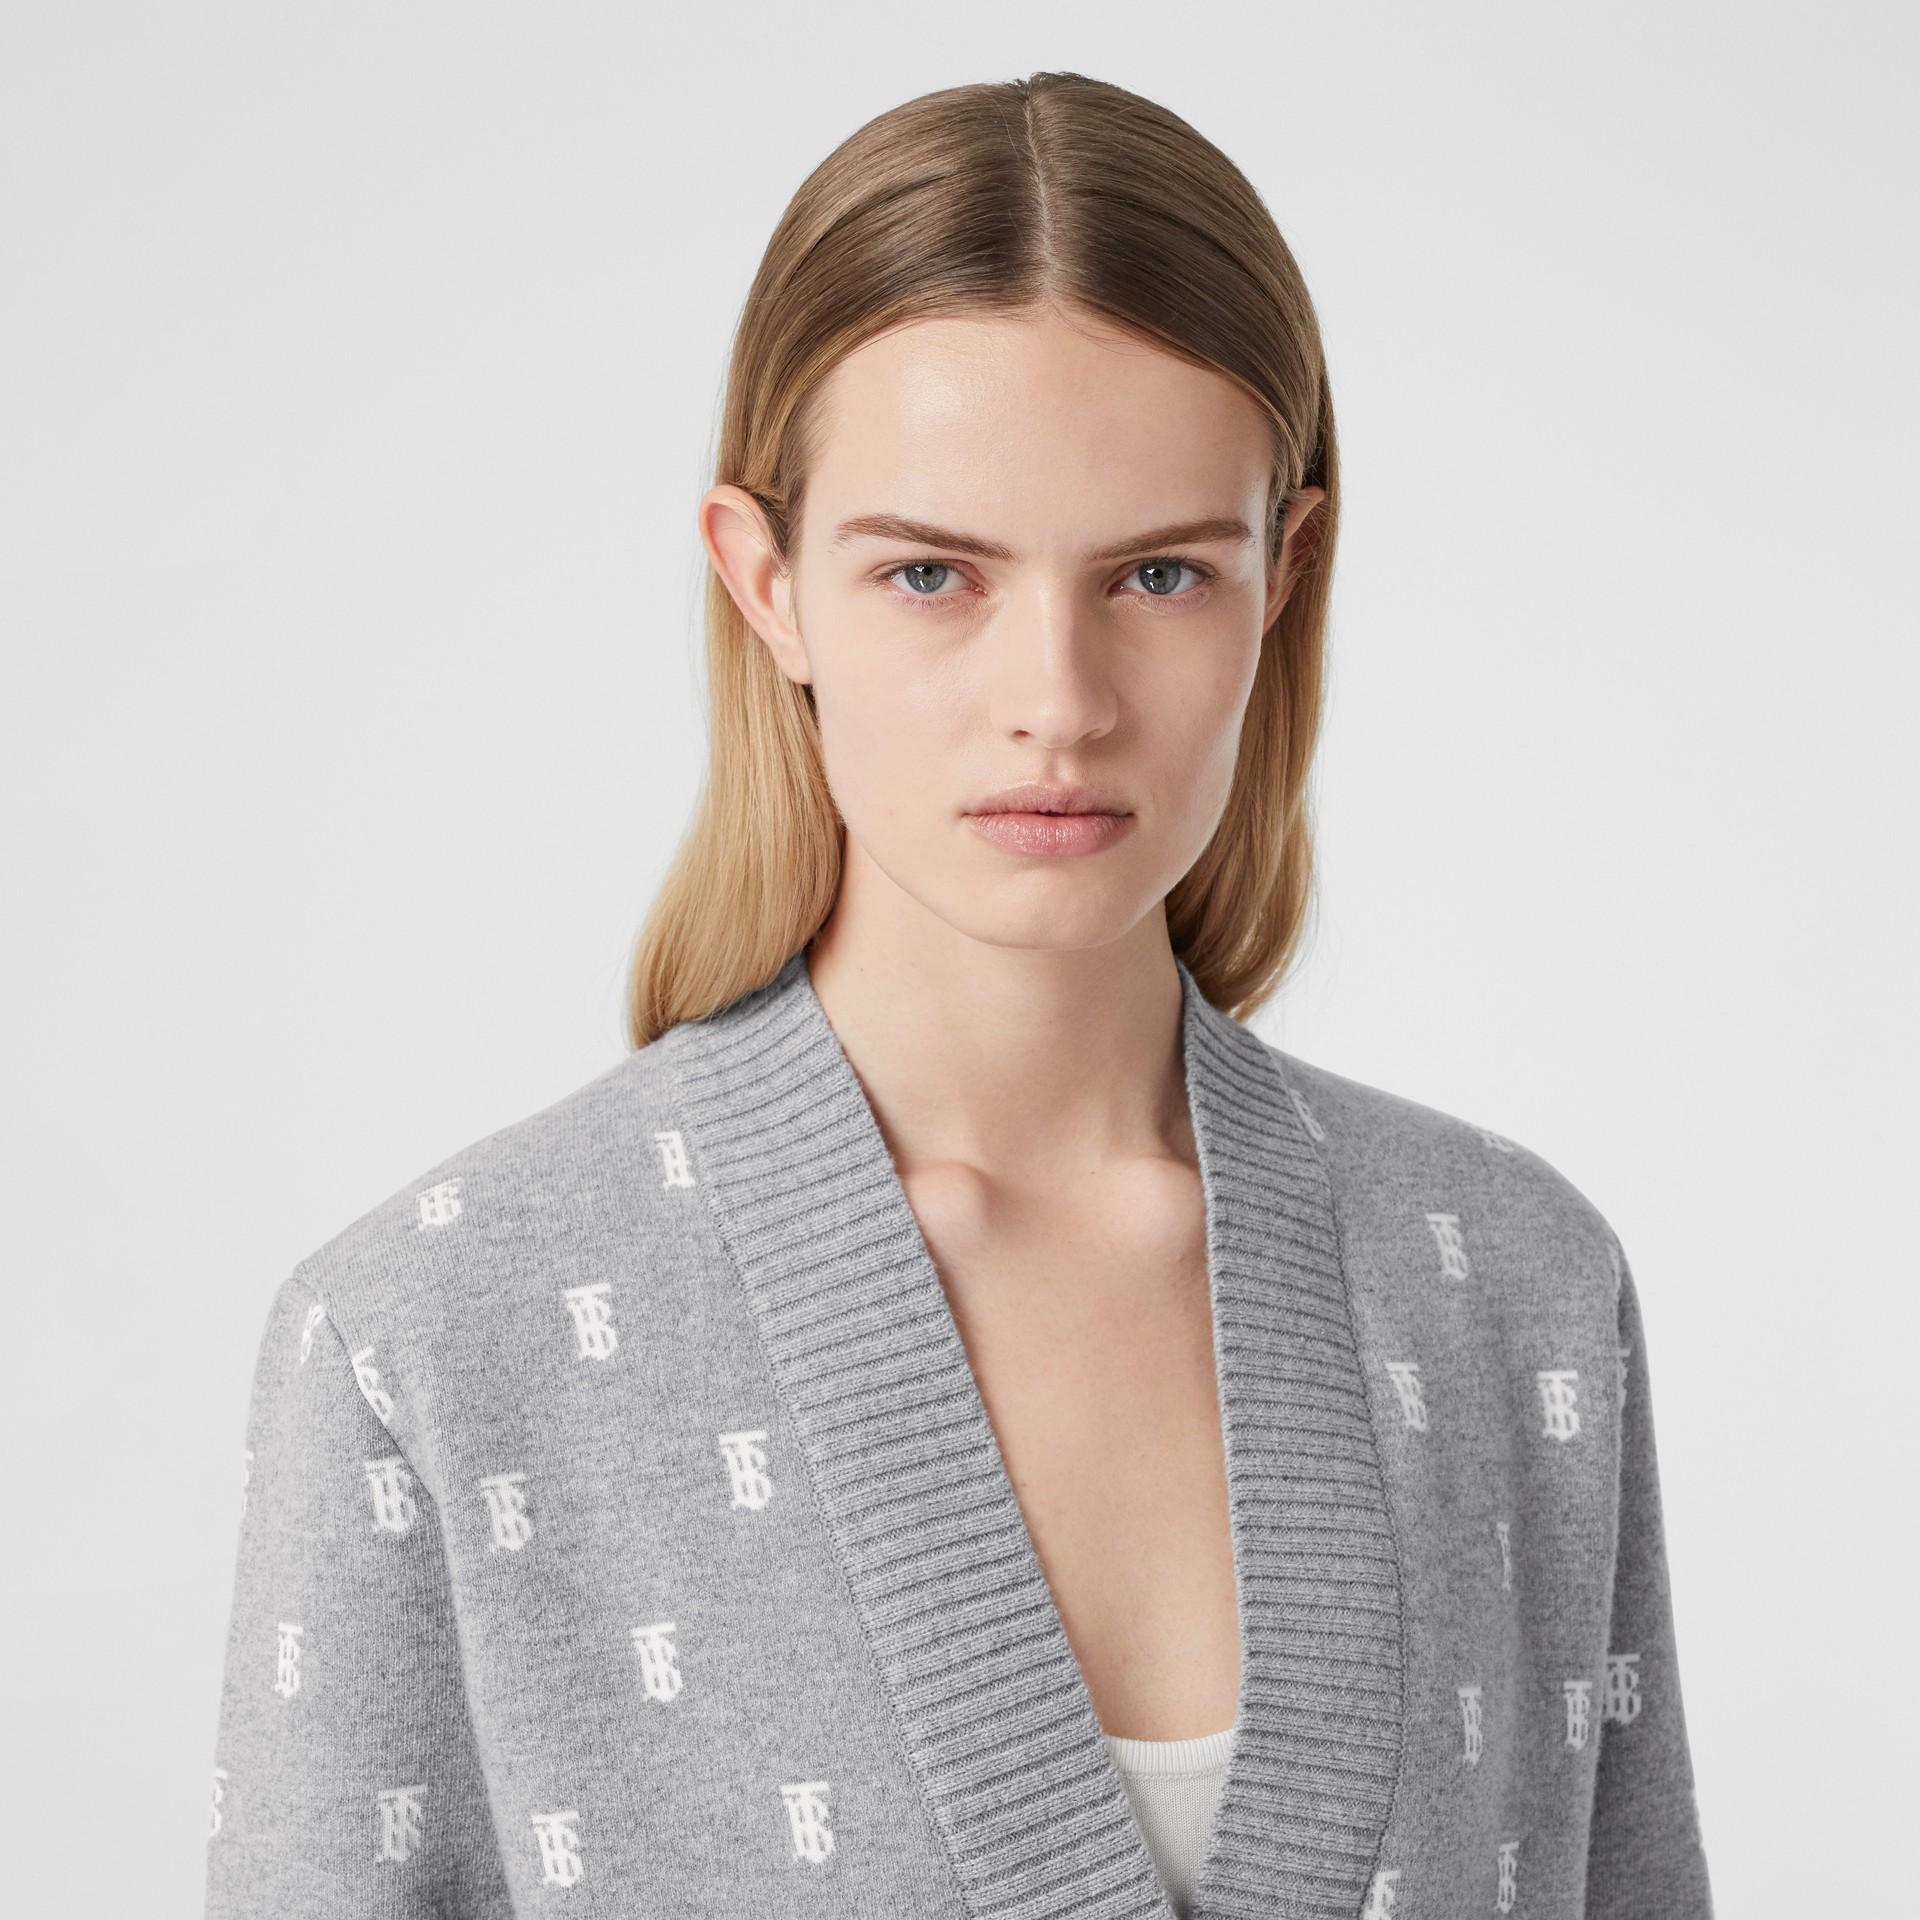 Monogram Wool Cashmere Blend Oversized Cardigan in Mid Grey Melange - Women | Burberry - gallery image 5